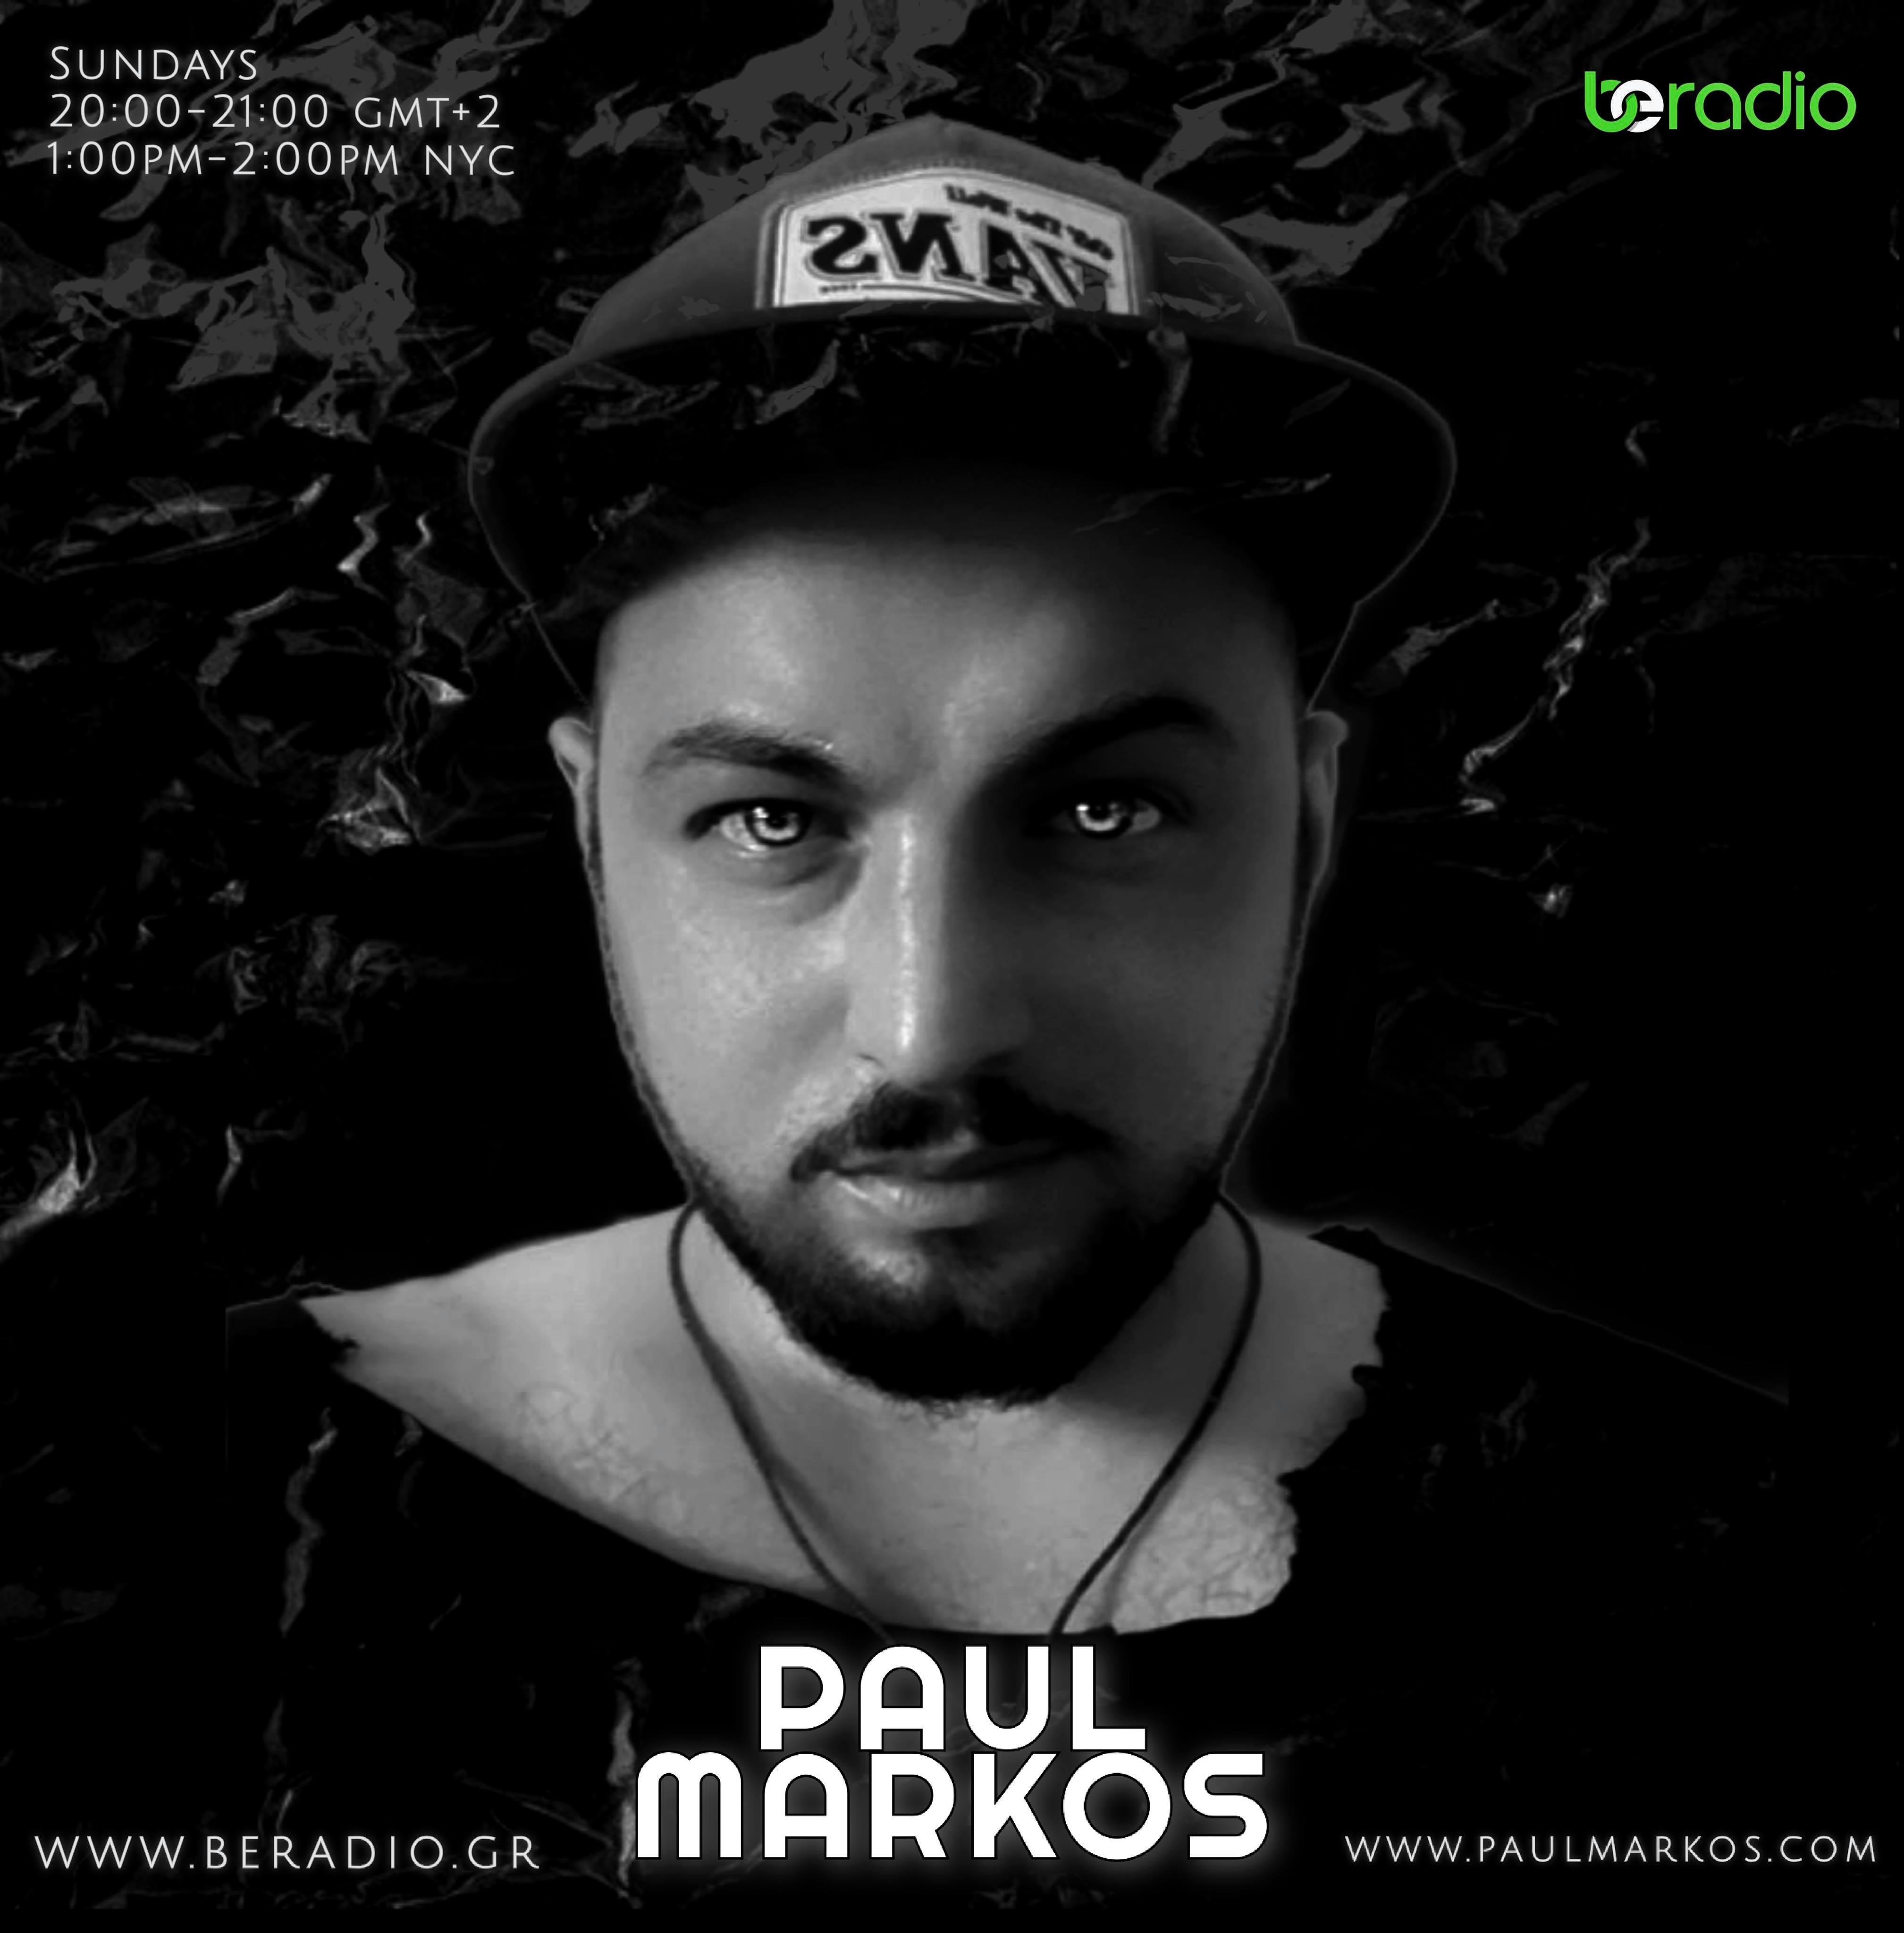 PAUL MARKOS